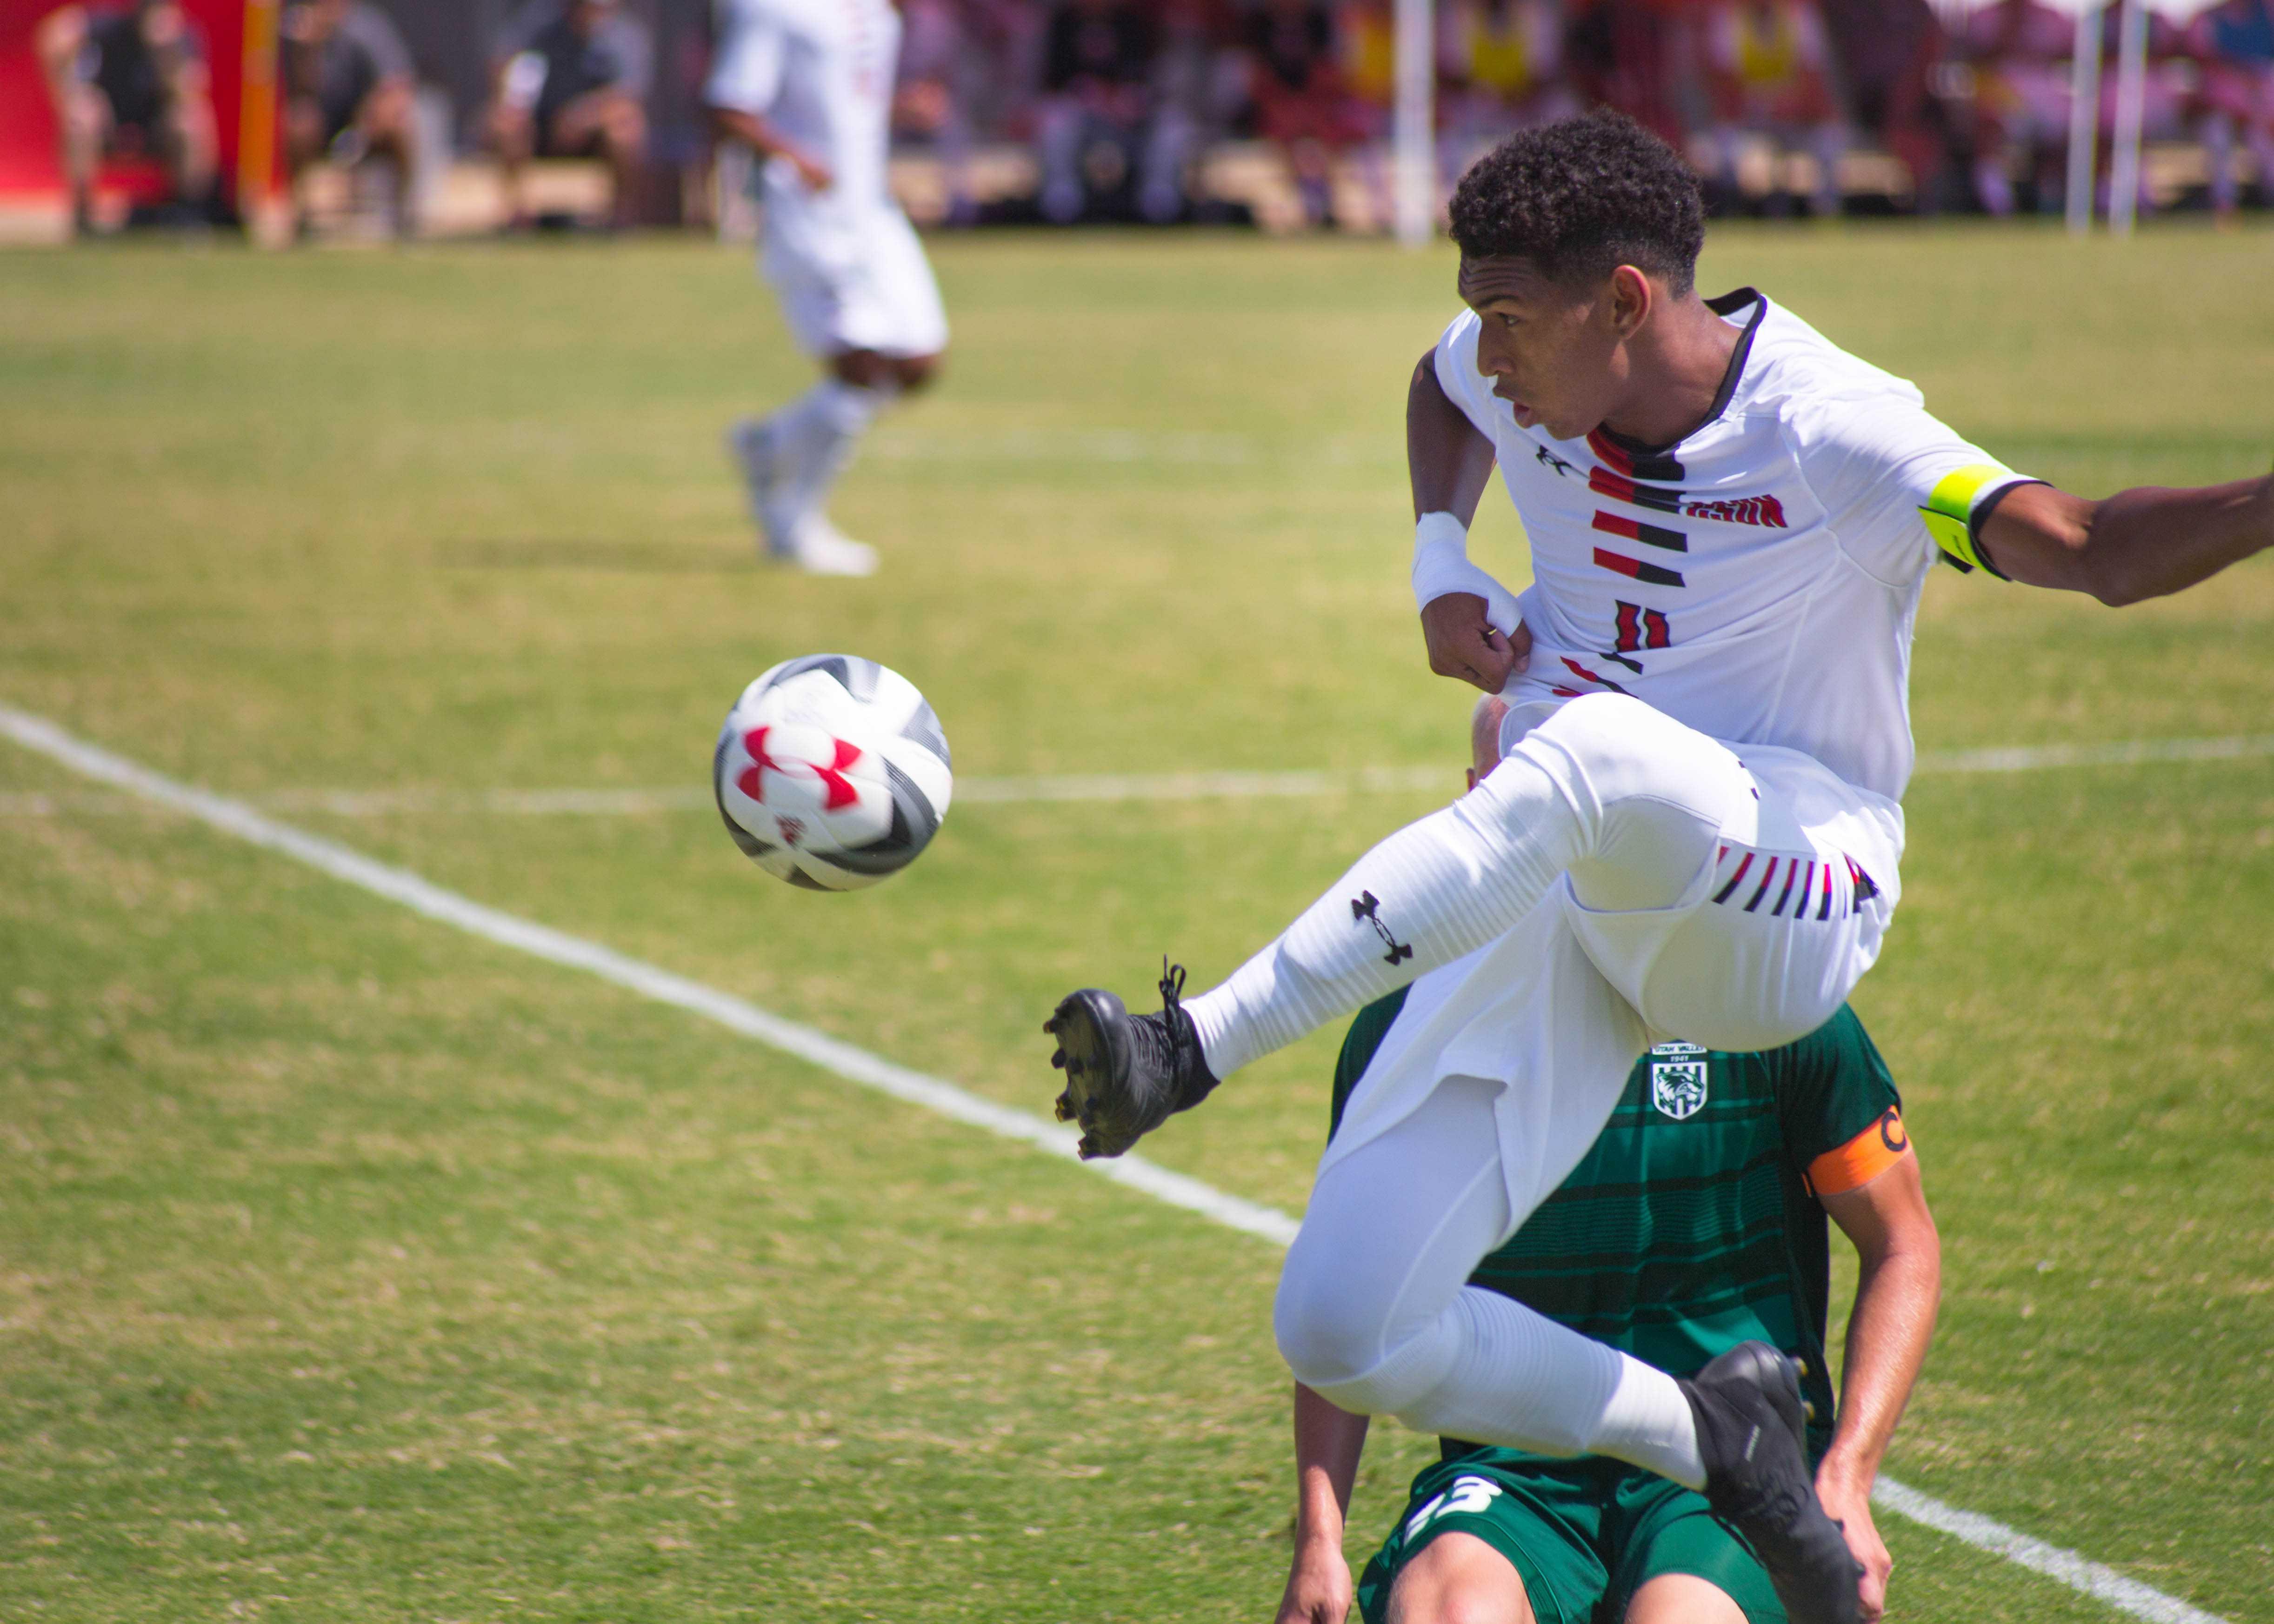 Defender Ehi Isidor jumps for the ball over a Utah Valley defender. Photo credit: John Hernandez